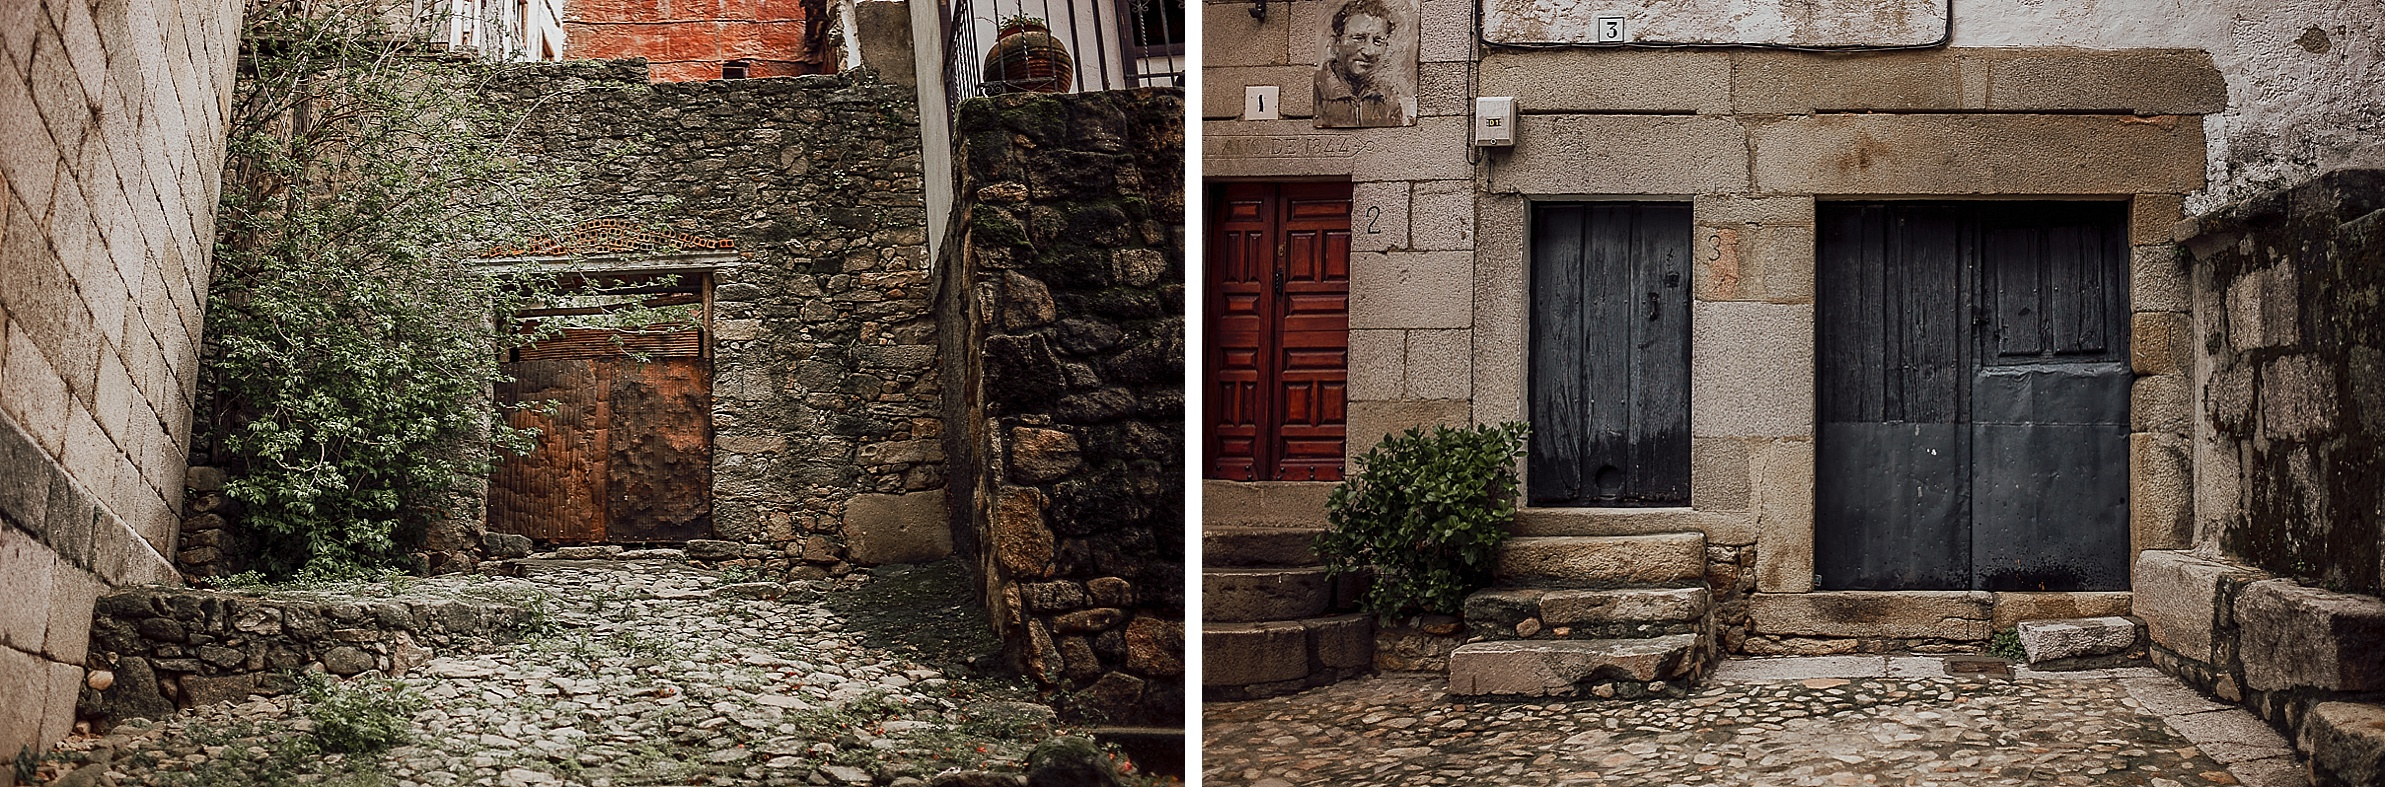 Fotografo-Salamanca-FedeGrau-51-.jpg